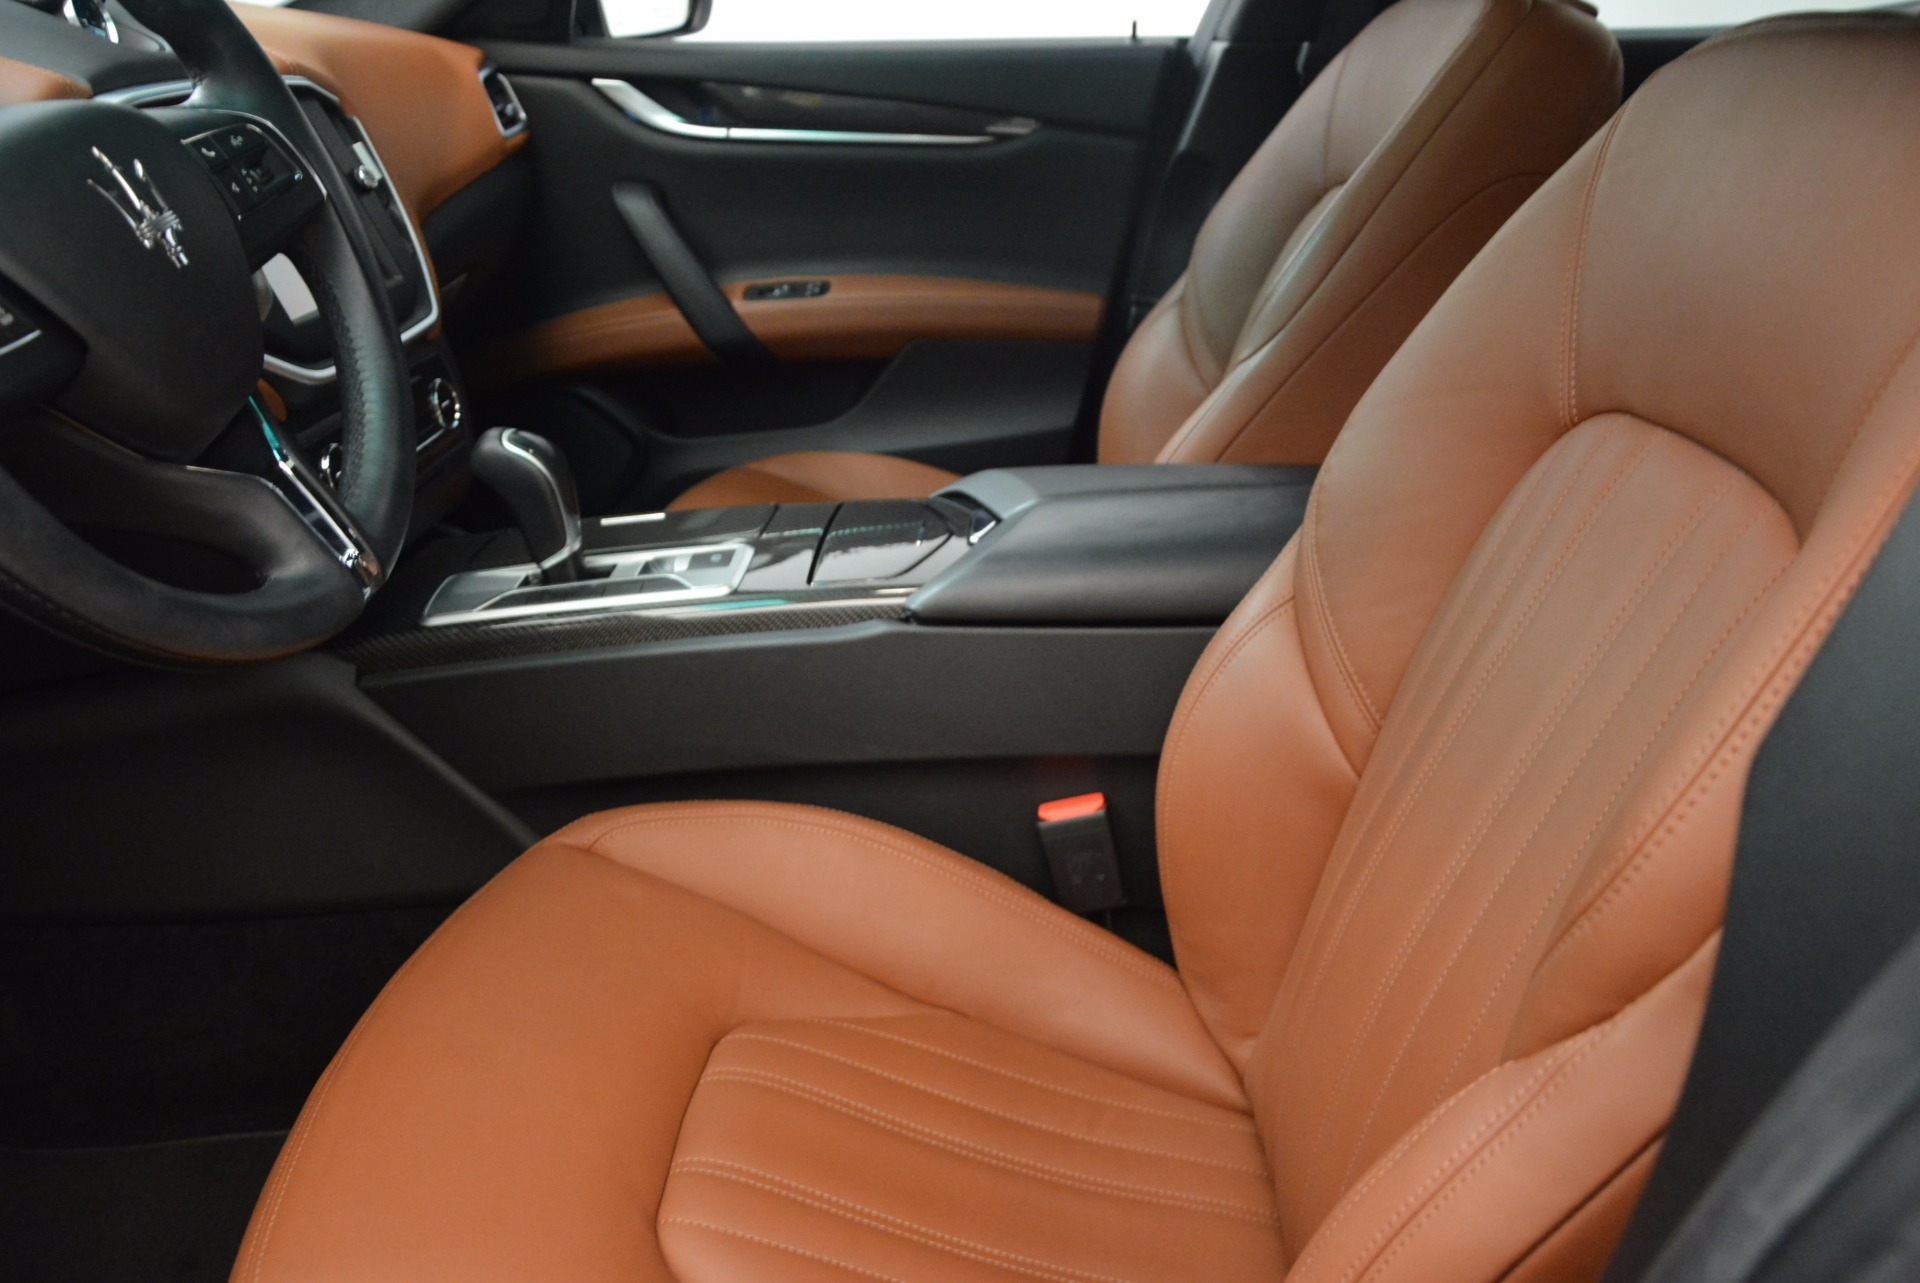 Used 2014 Maserati Ghibli S Q4 For Sale In Greenwich, CT 1587_p15